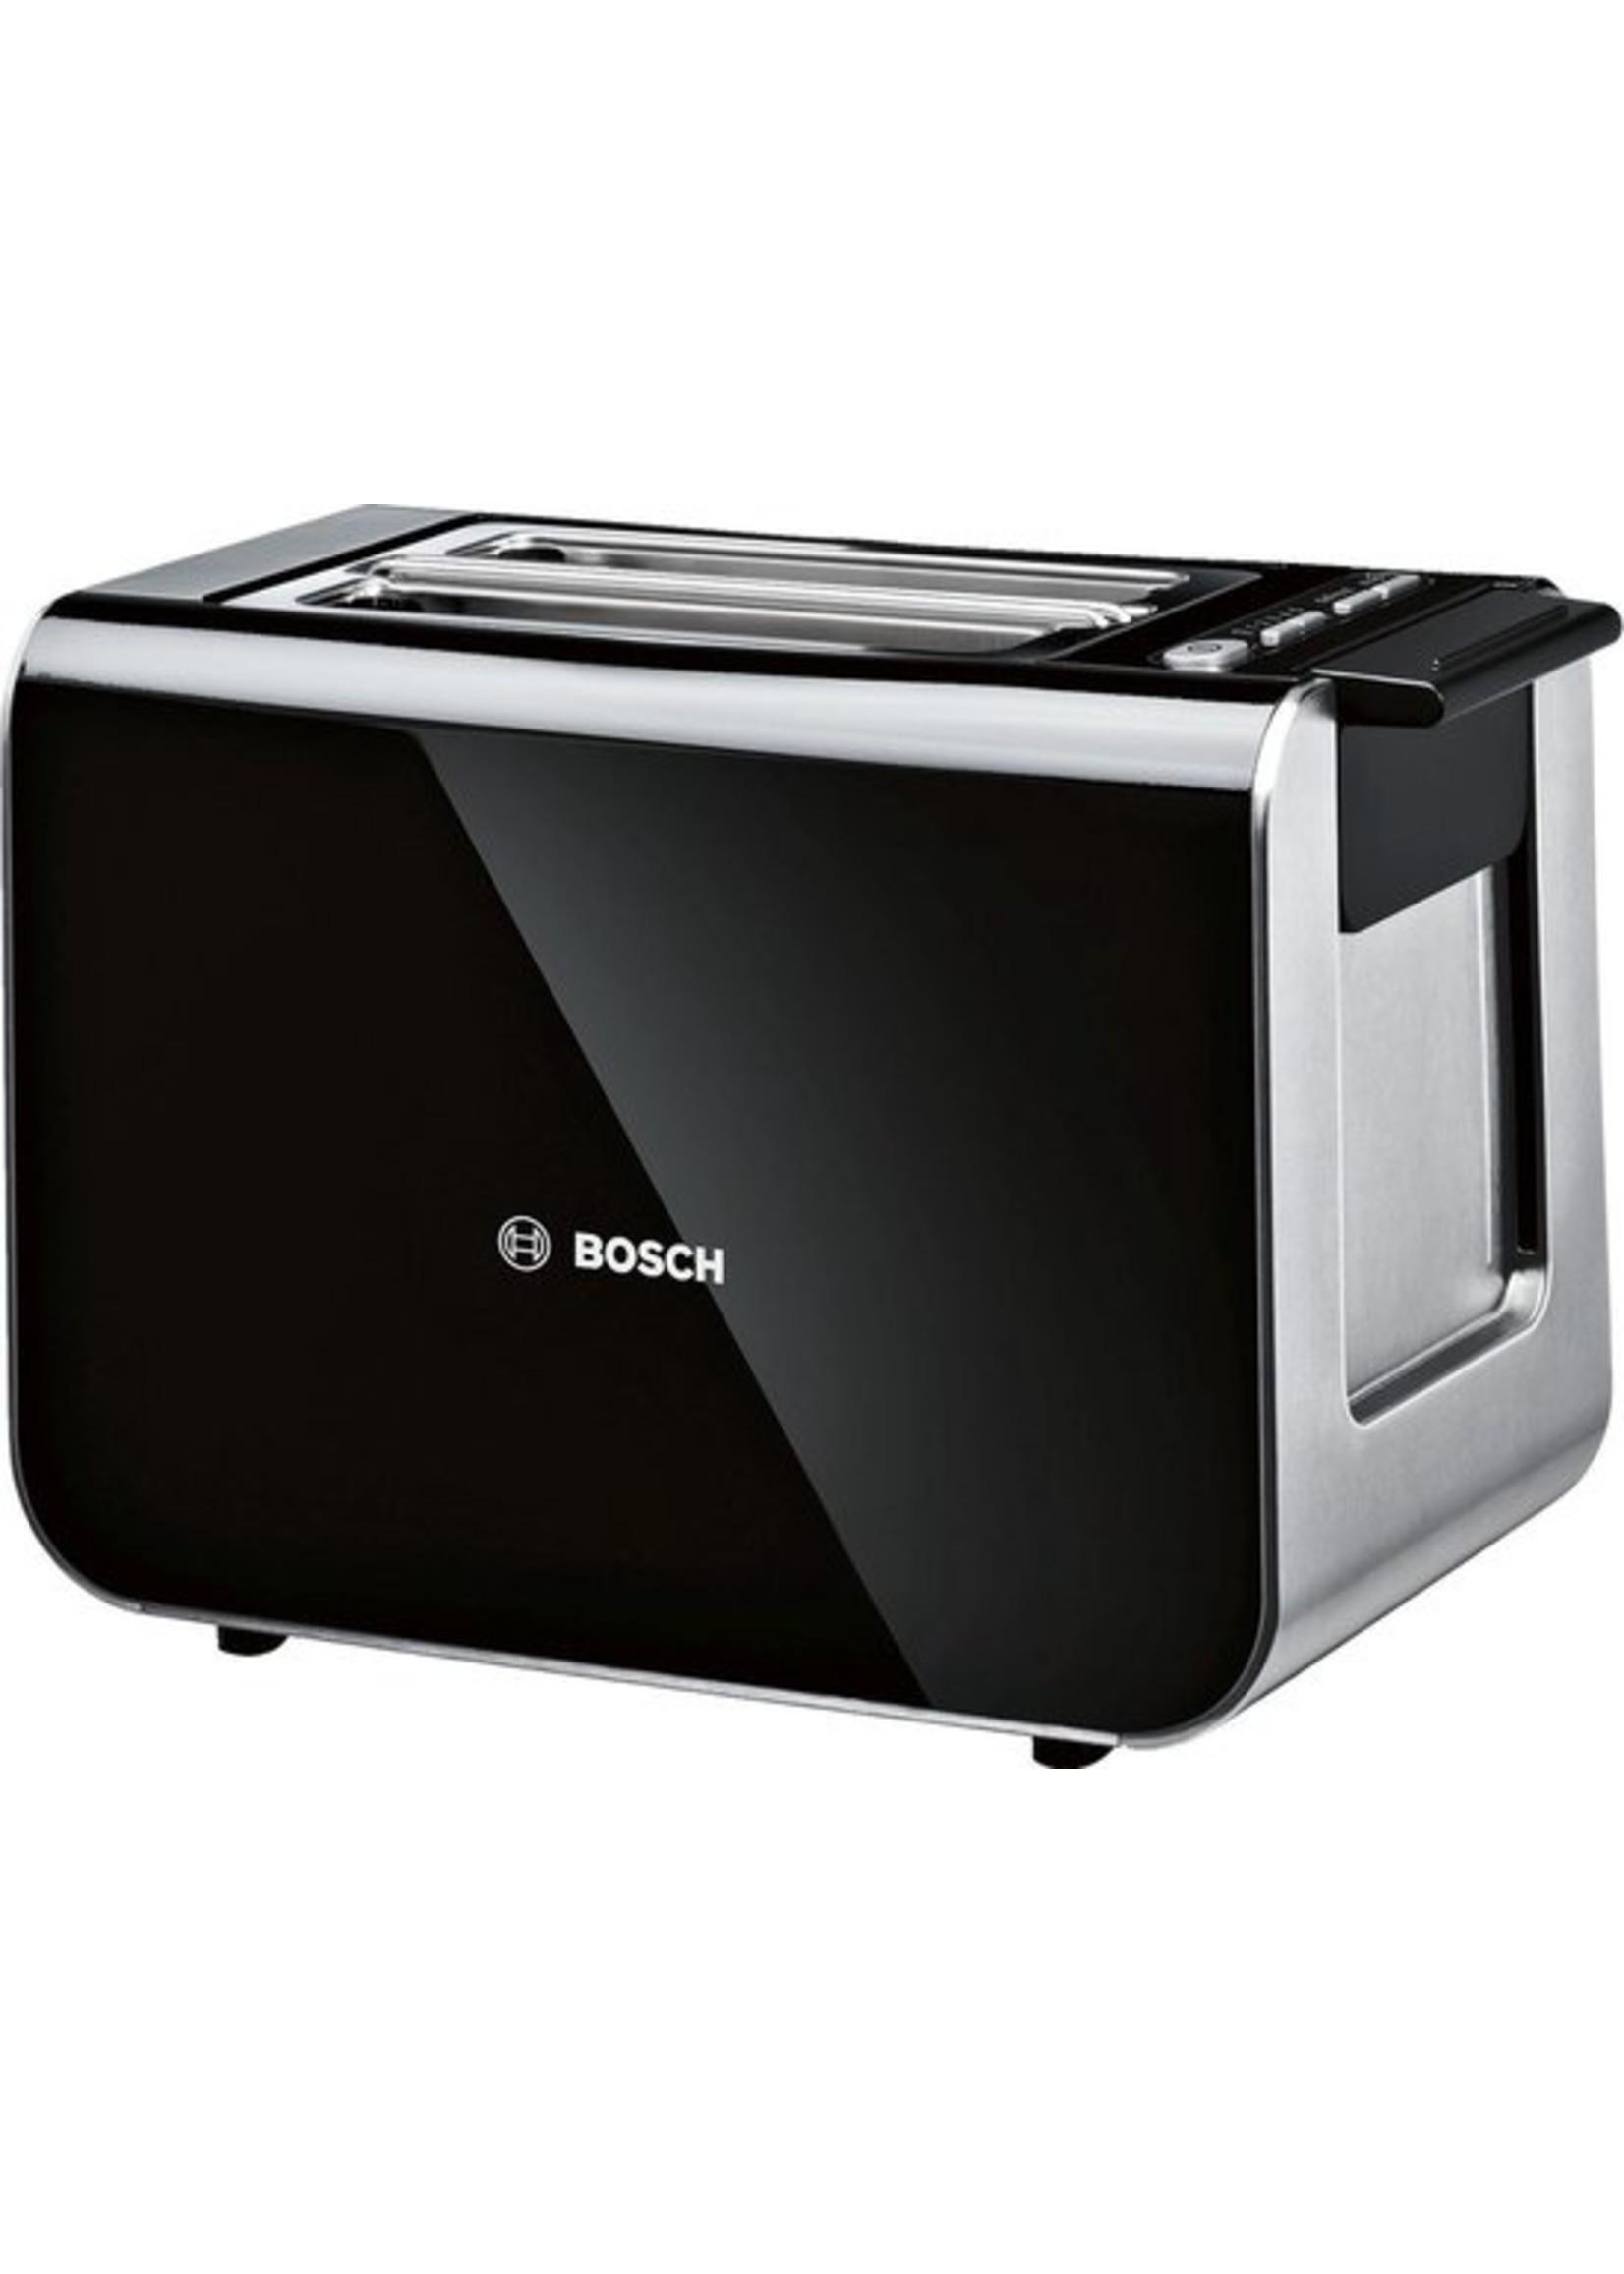 Bosch Bosch TAT8613 Styline - Broodrooster - Piano Zwart